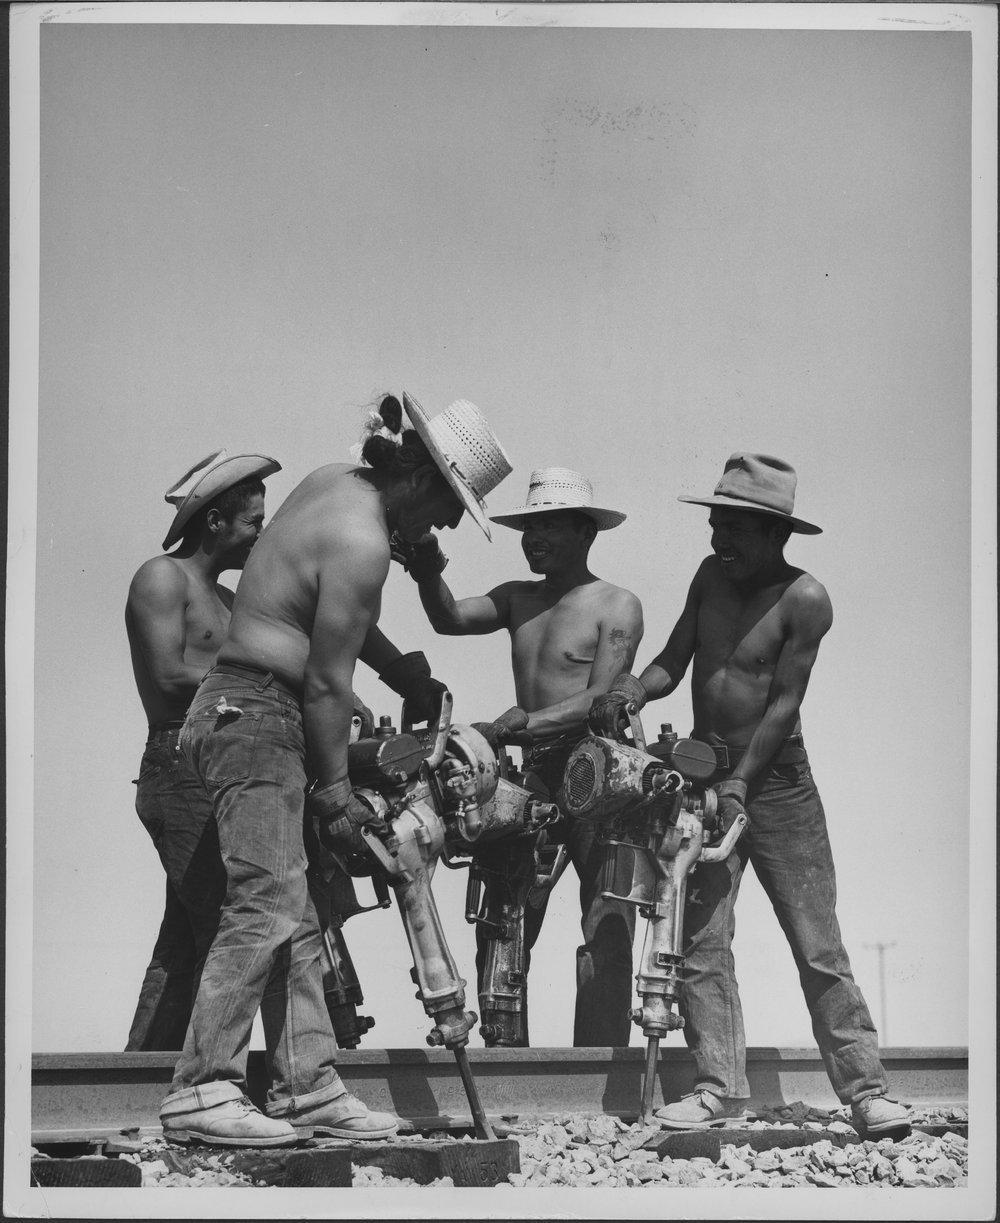 Atchison, Topeka & Santa Fe Railway Company workers